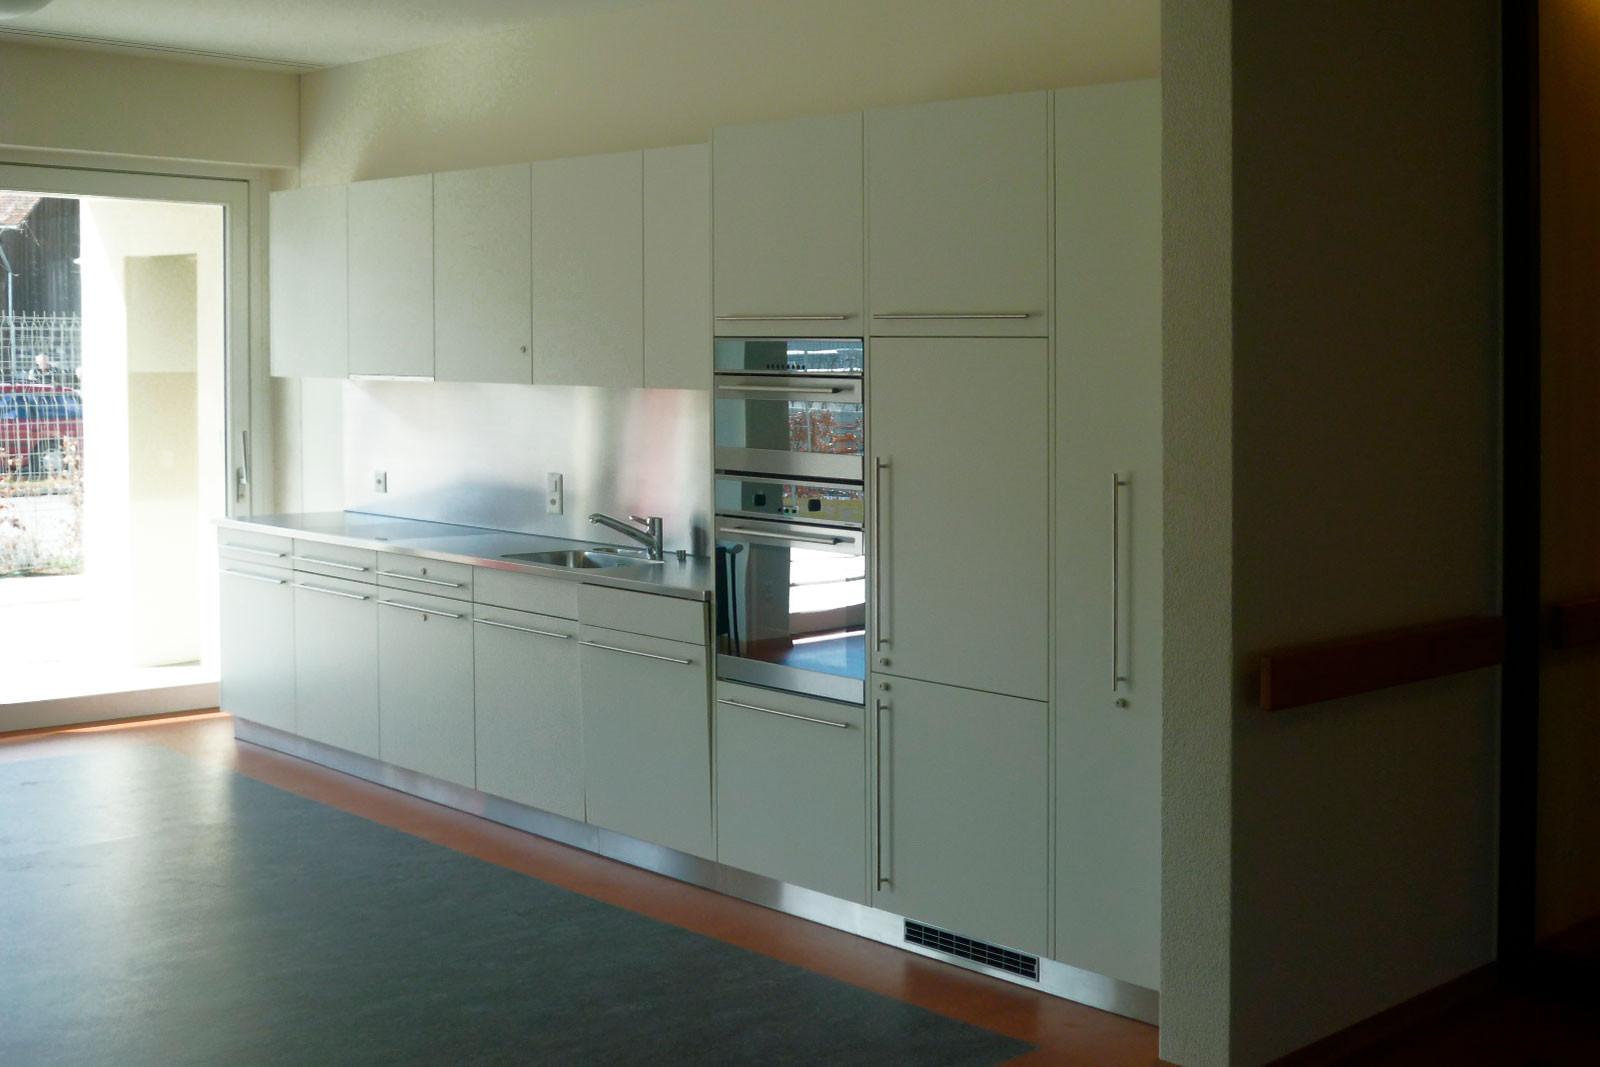 Riggisberg residential home, Campanile Michetti AG, Bern